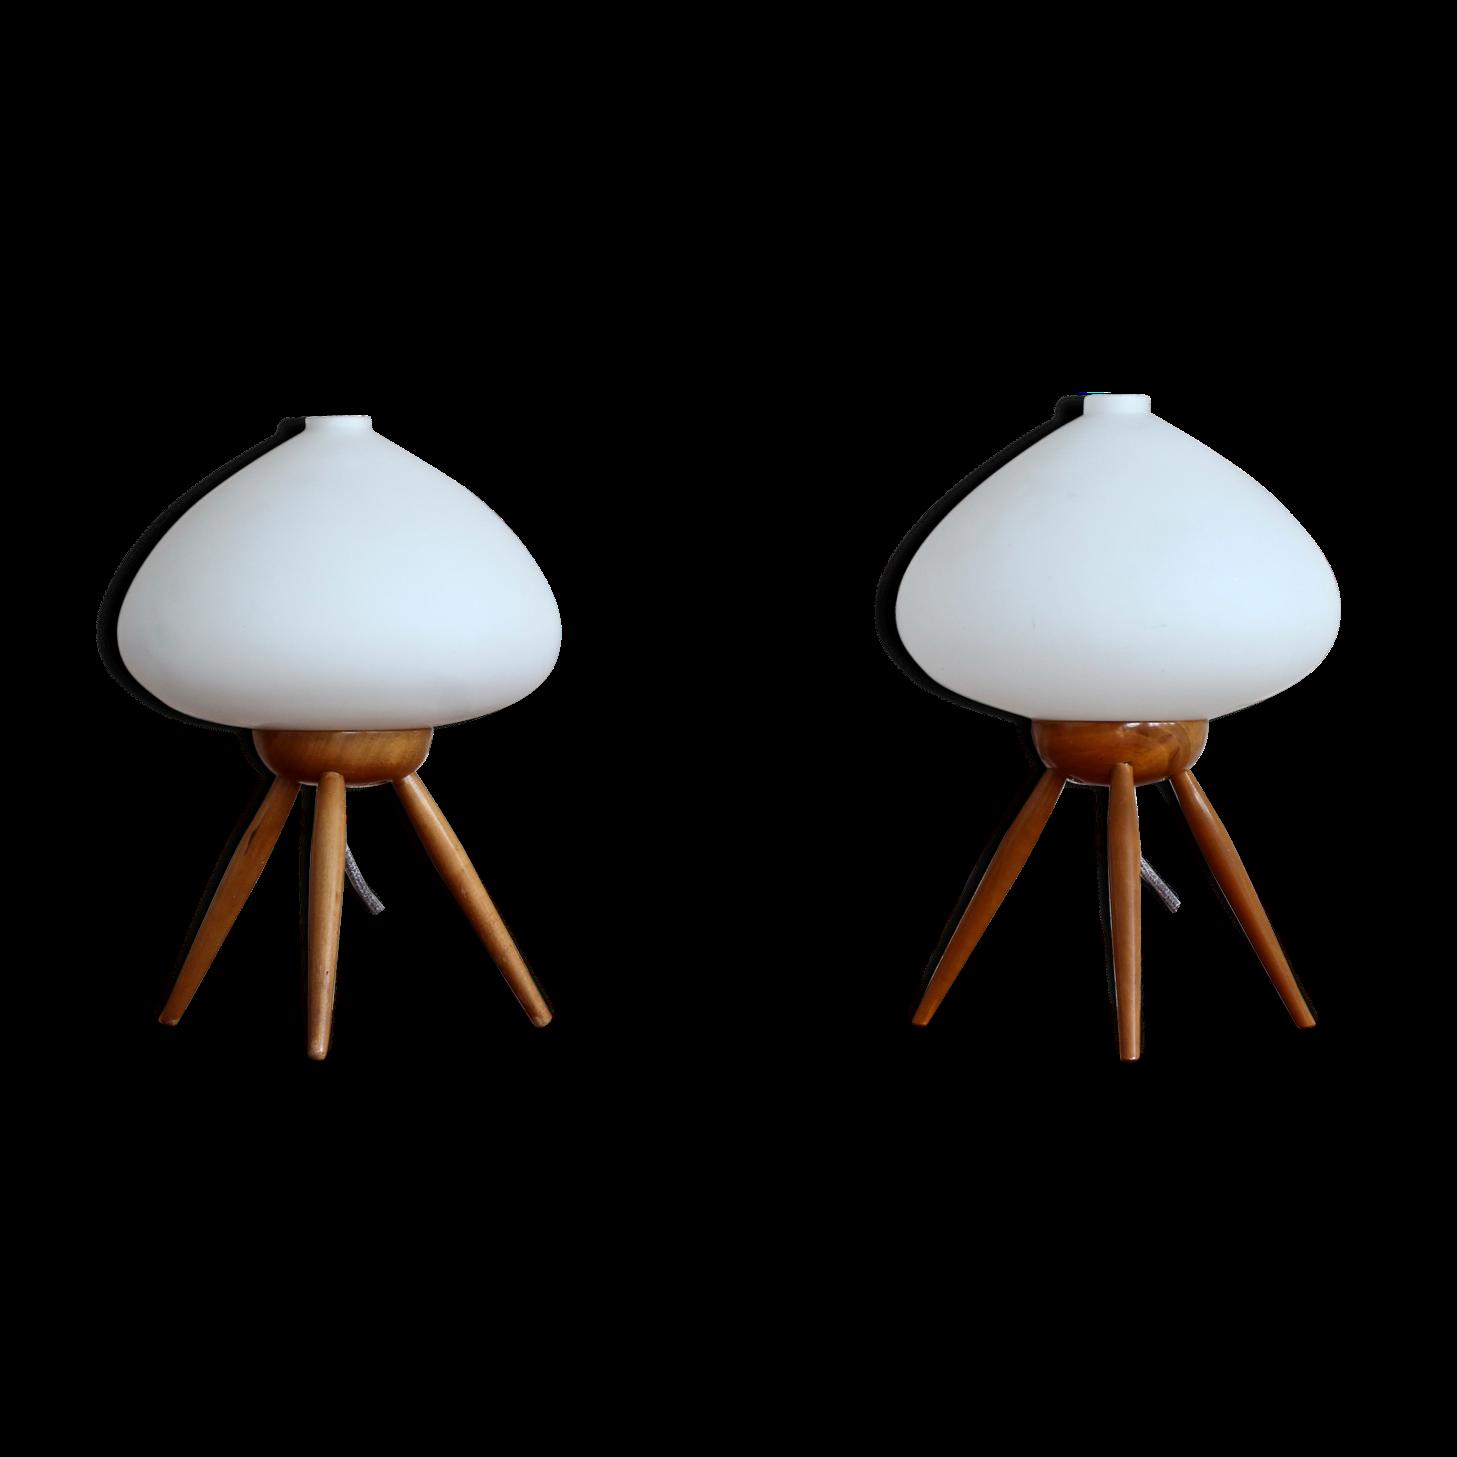 Set Of 2 Table Lamps By Uluv Space Age 1960s Lampes De Table Blanc Et Vendanges